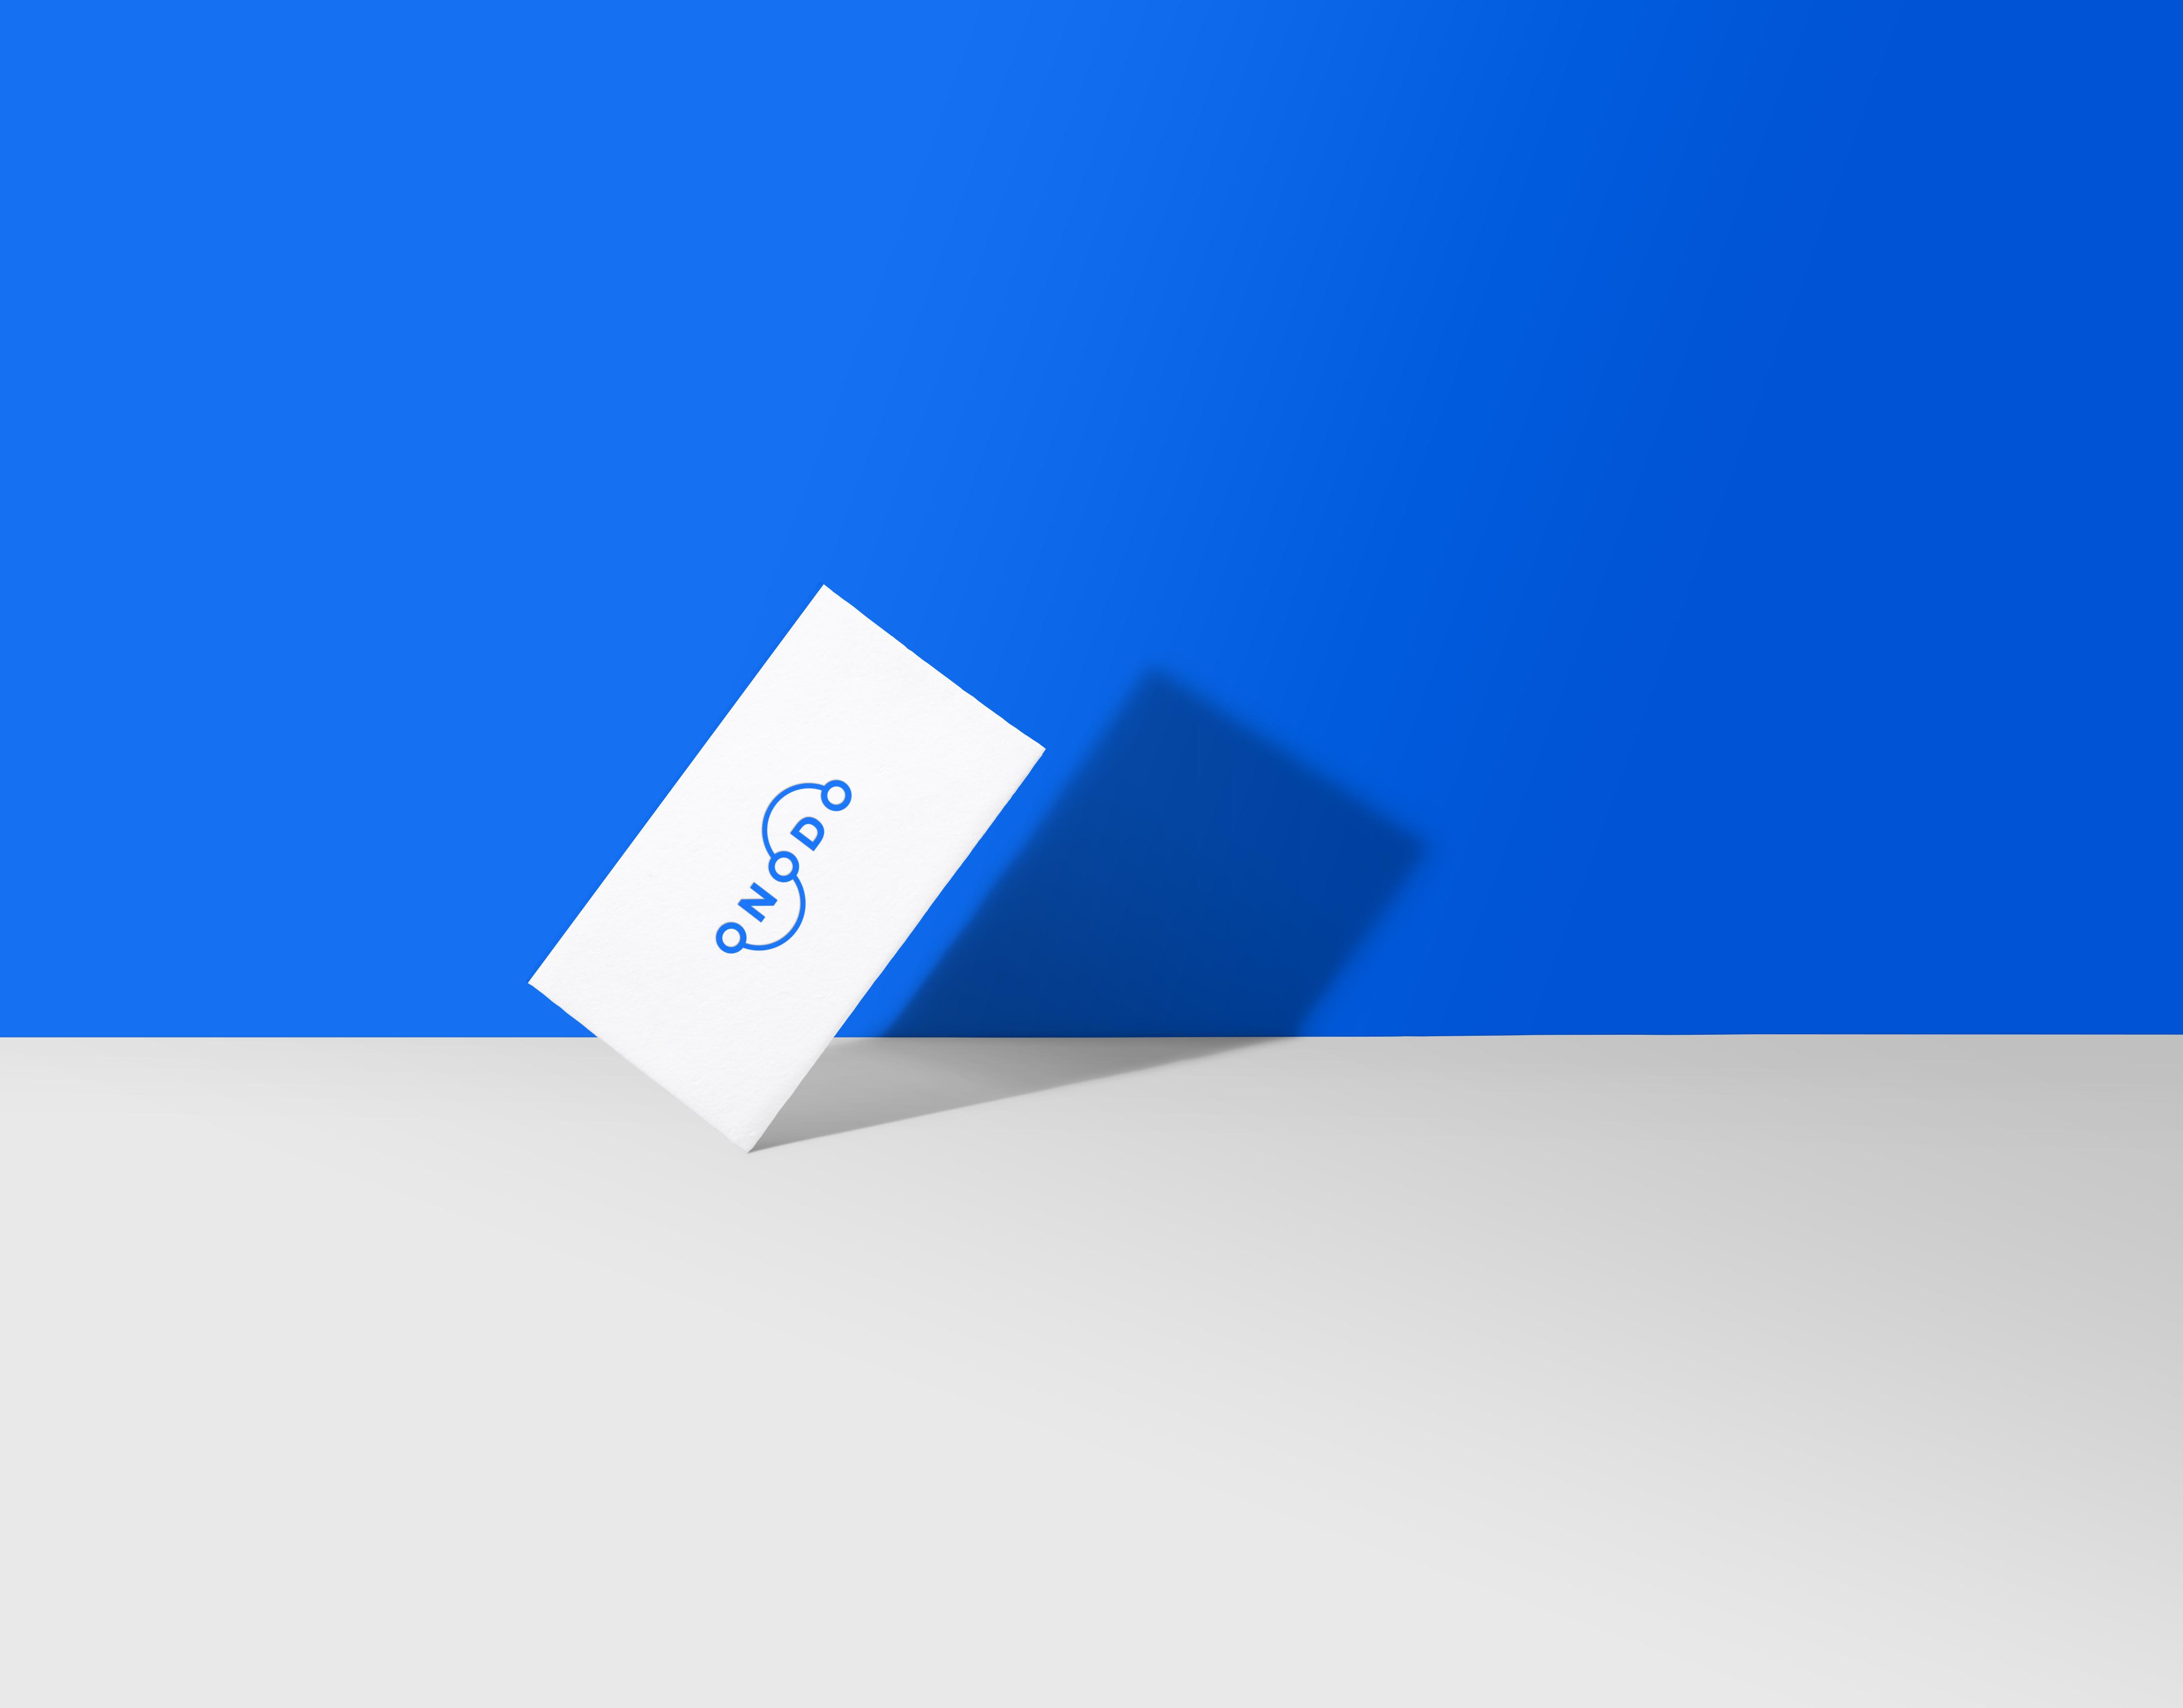 Onodo Branding & UI Design by The Woork Co